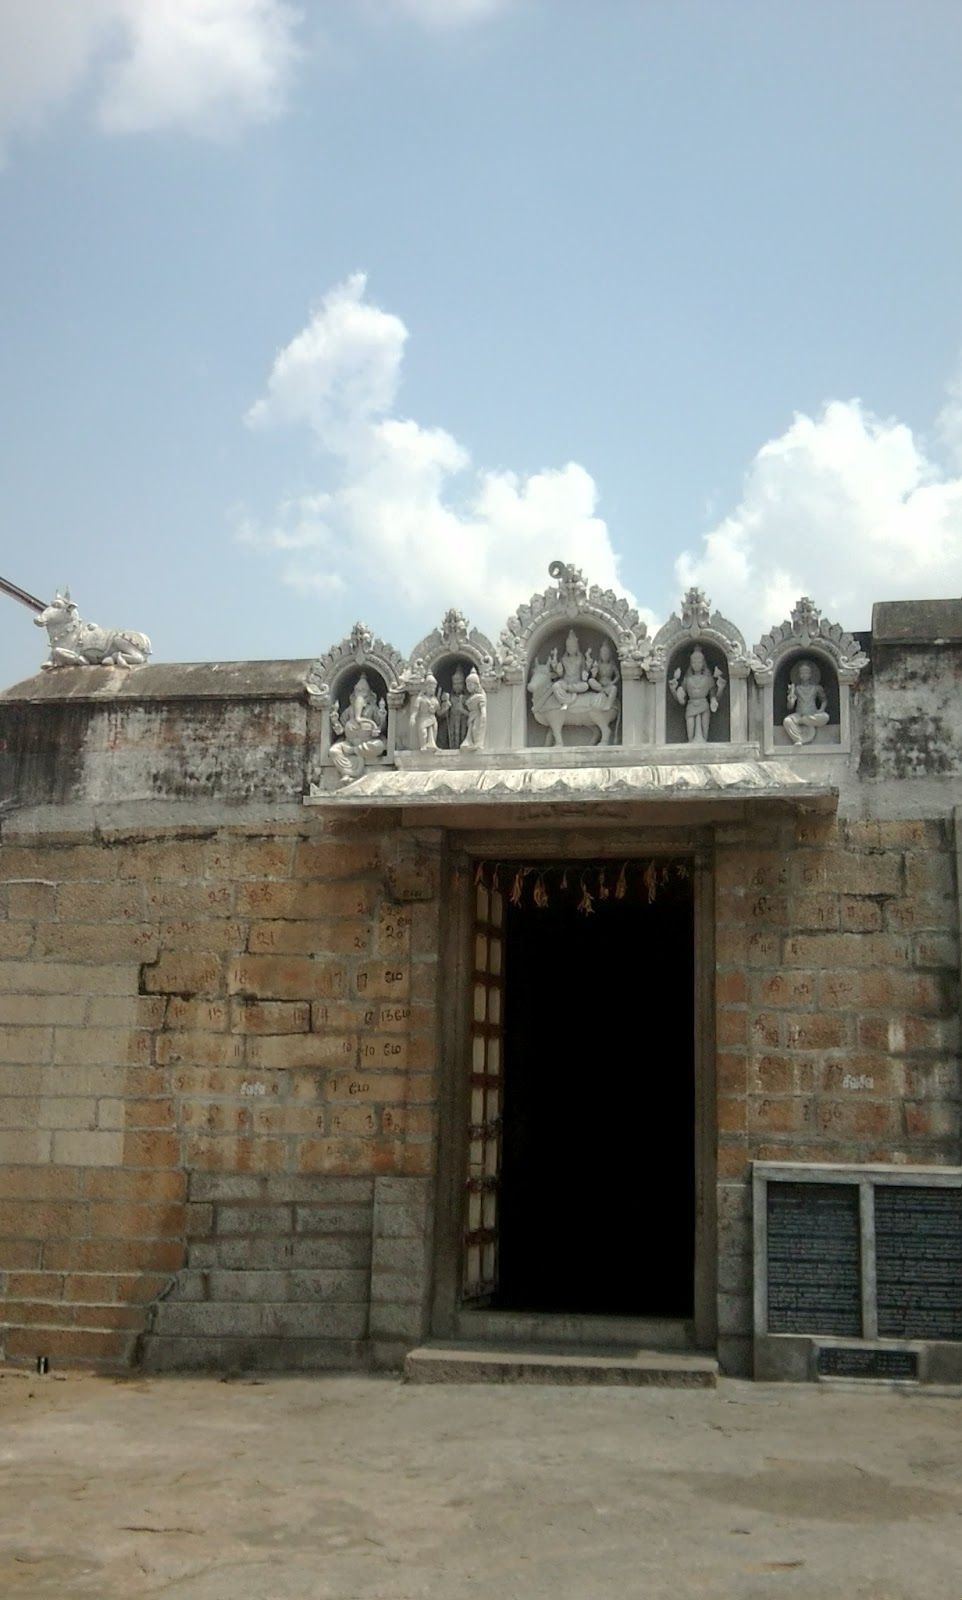 Araiyani Nallur, Arai Kanda Nallur, Thirukovilur, Shri Ramana Bhagavan, Shiva Temple near Tiruvannamalai